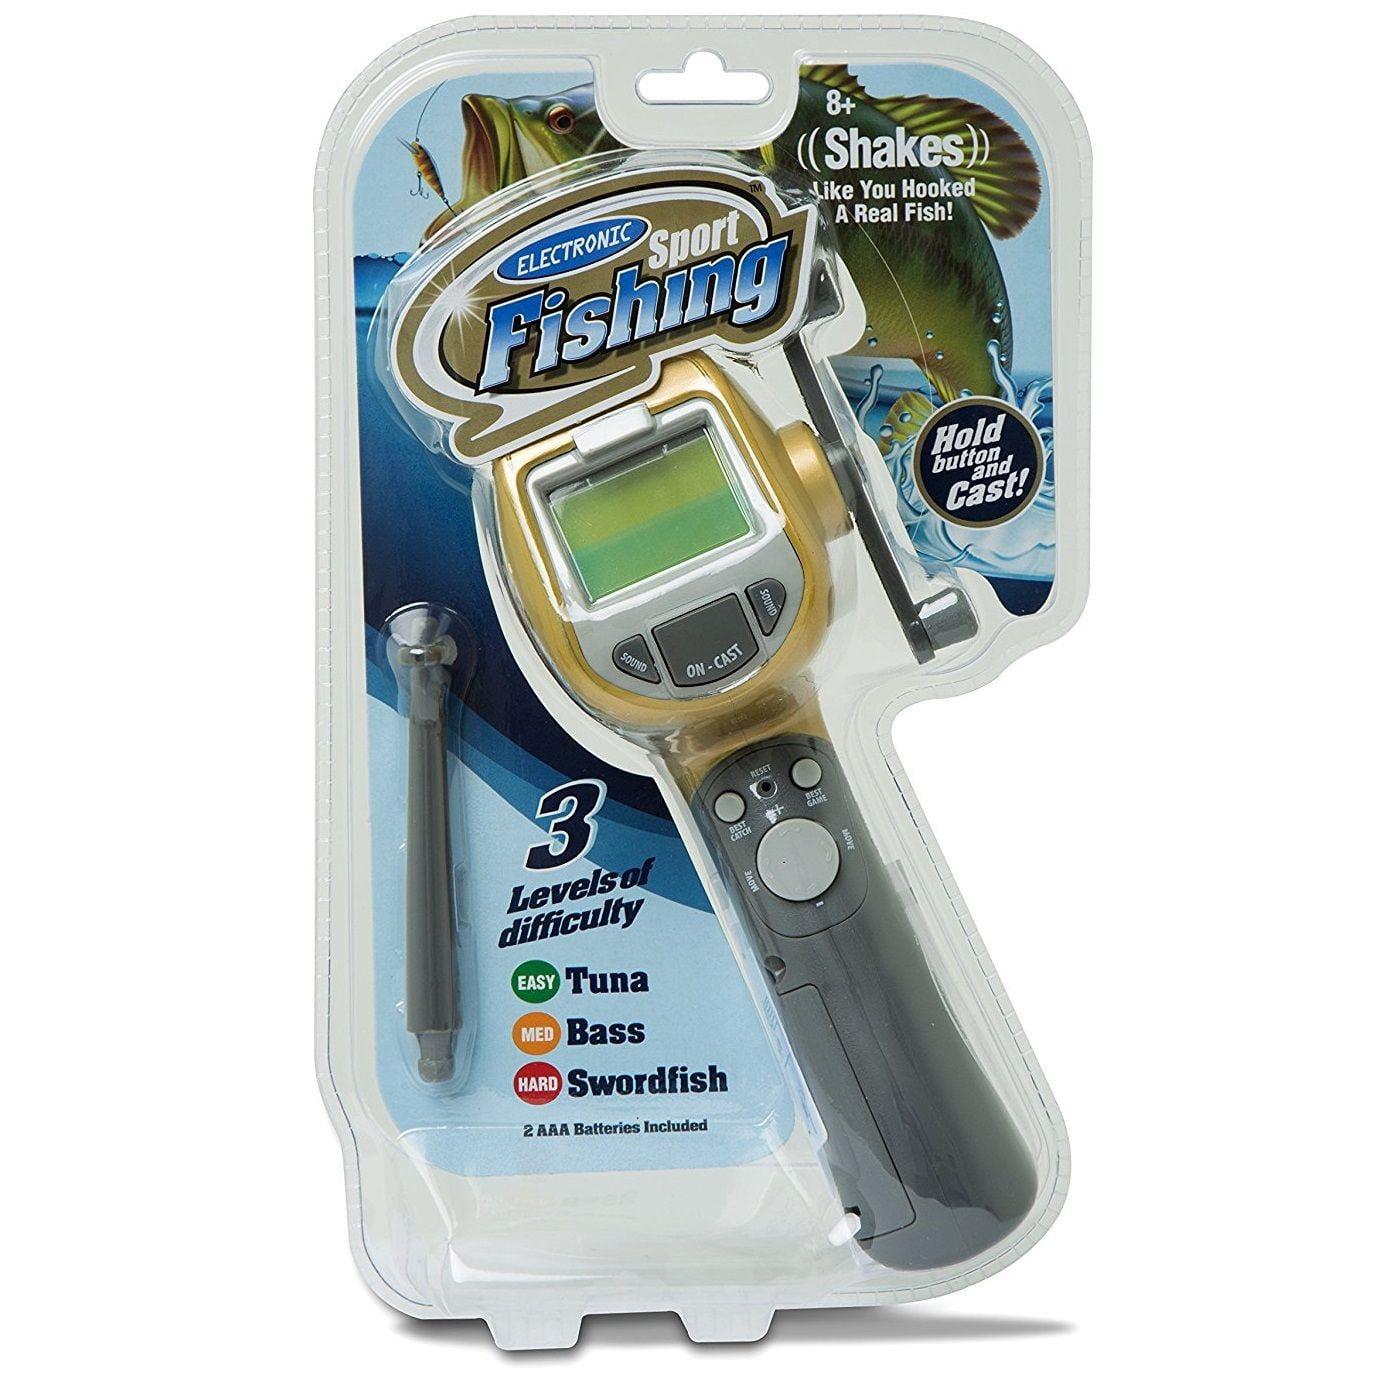 Electronic Sport Fishing Game